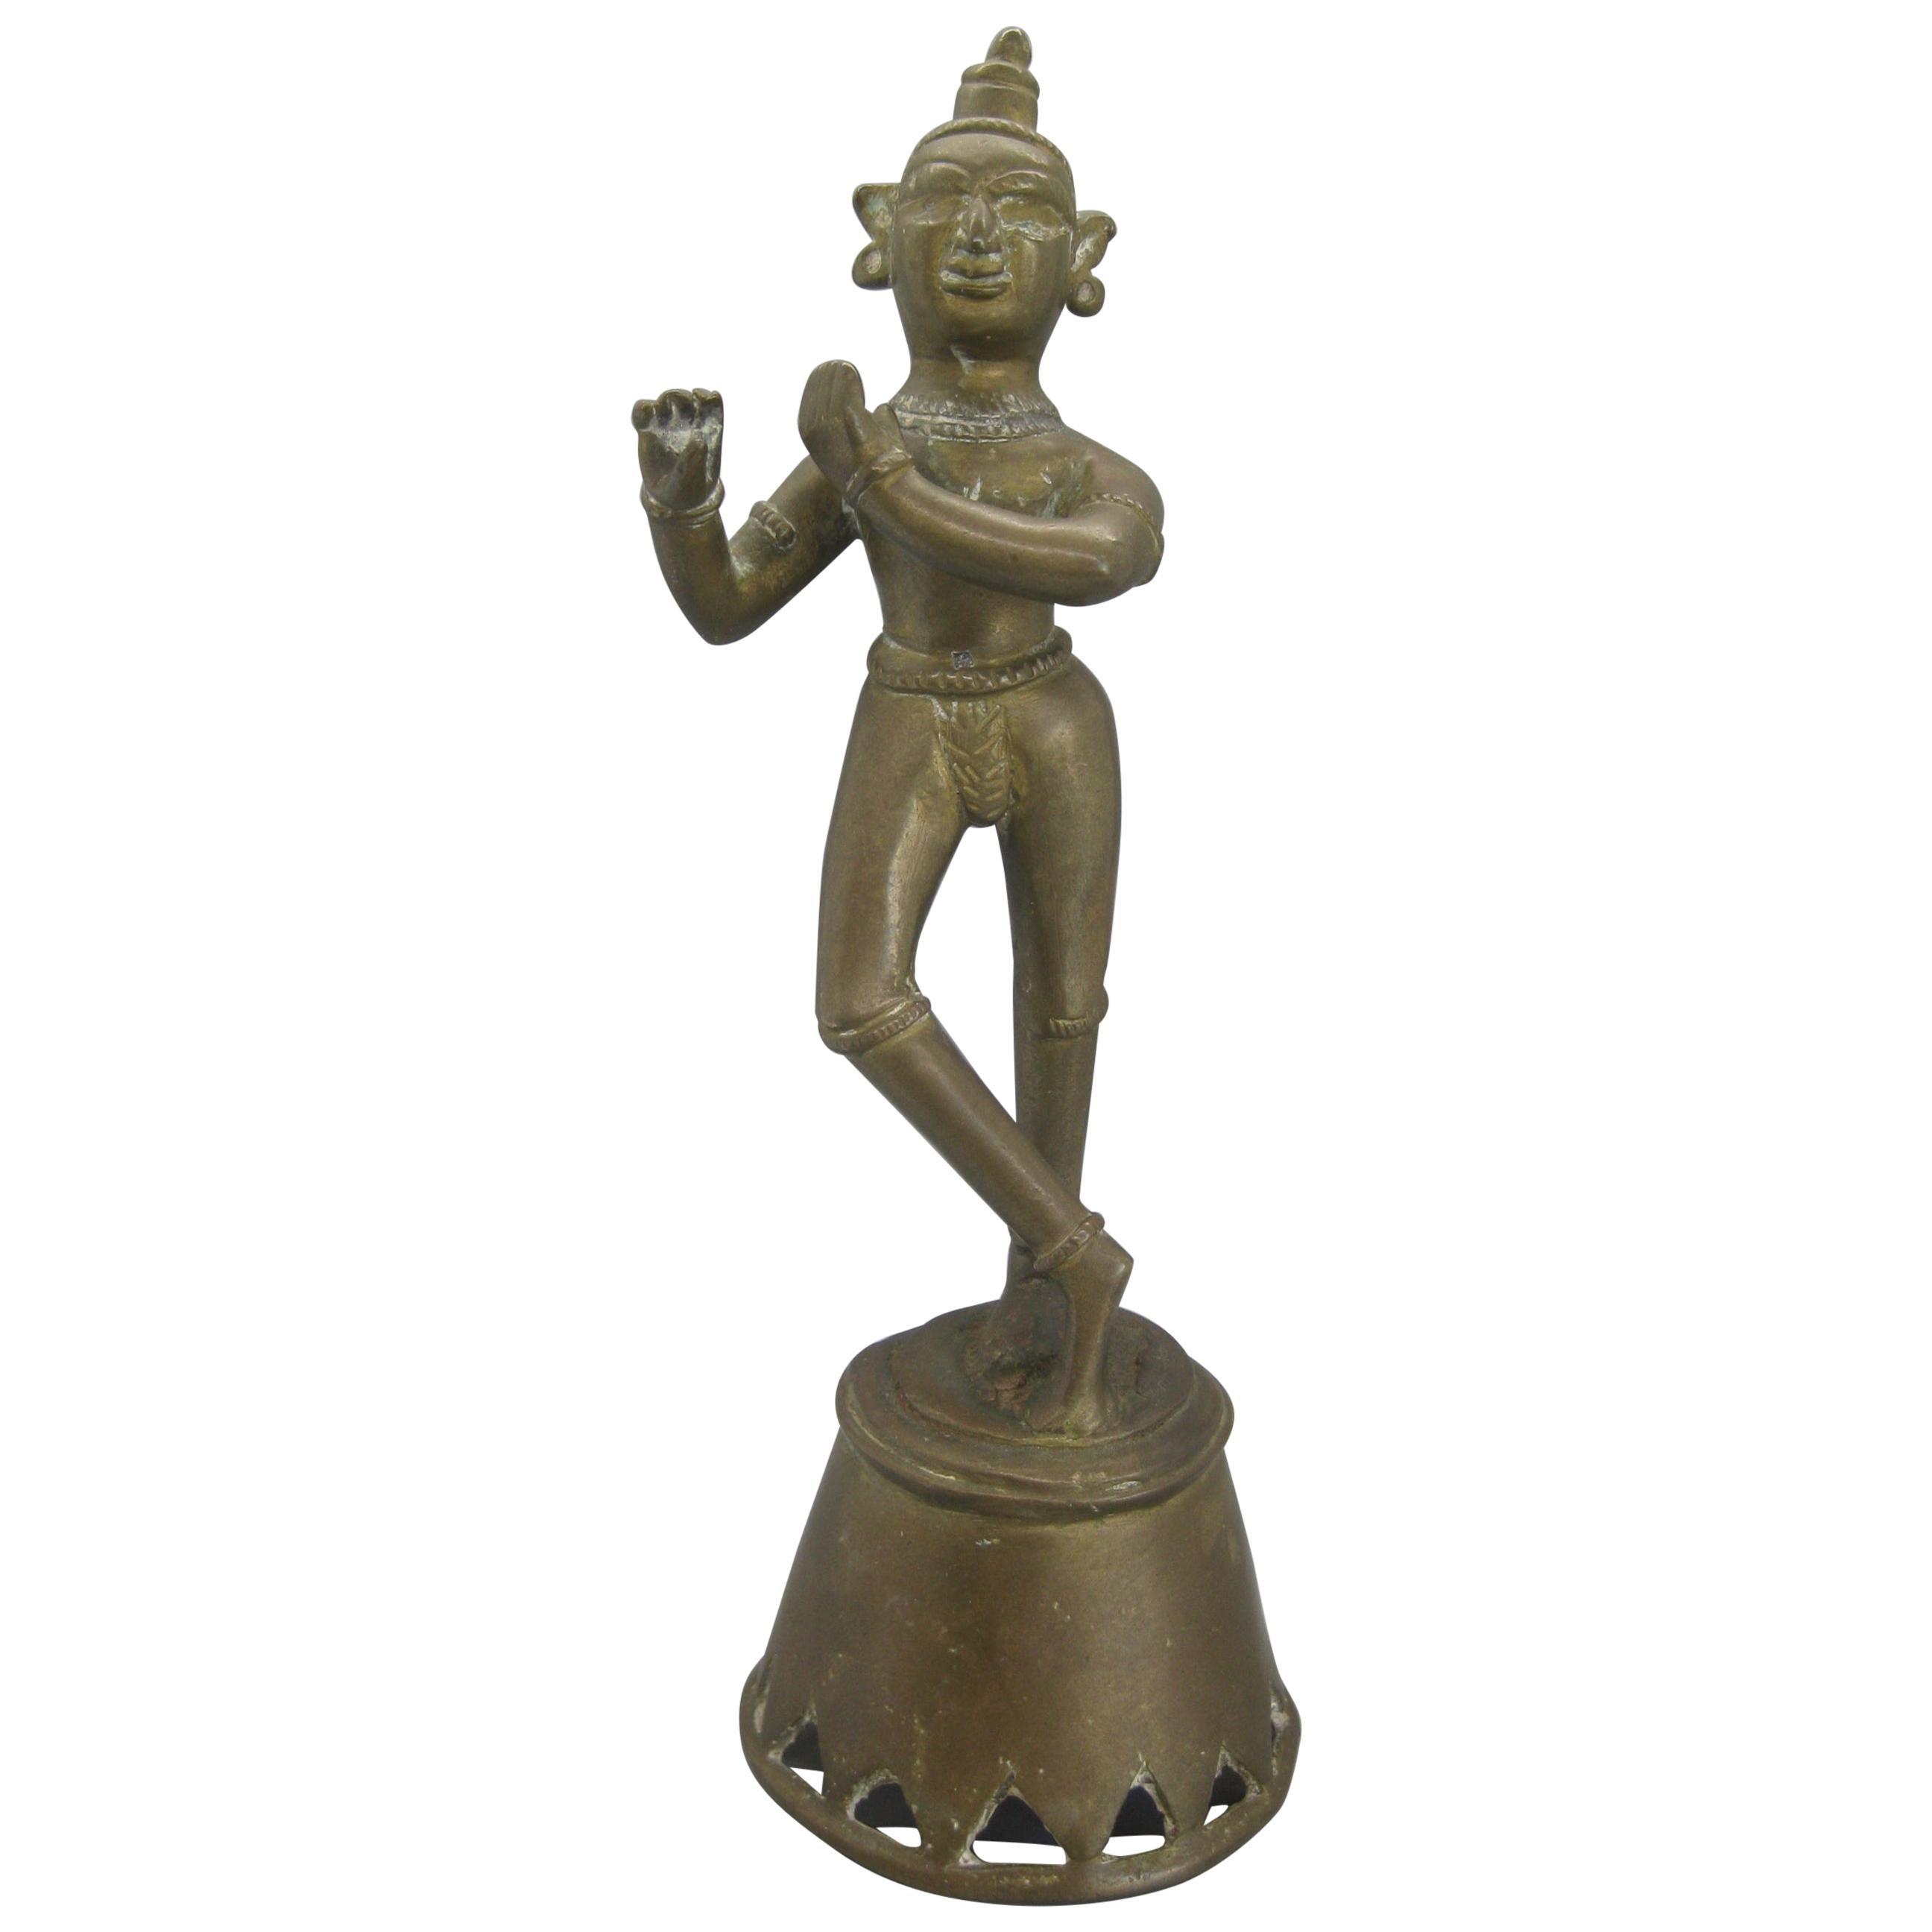 Antique India Hindu Lord Krishna Brass Standing Statue Sculpture